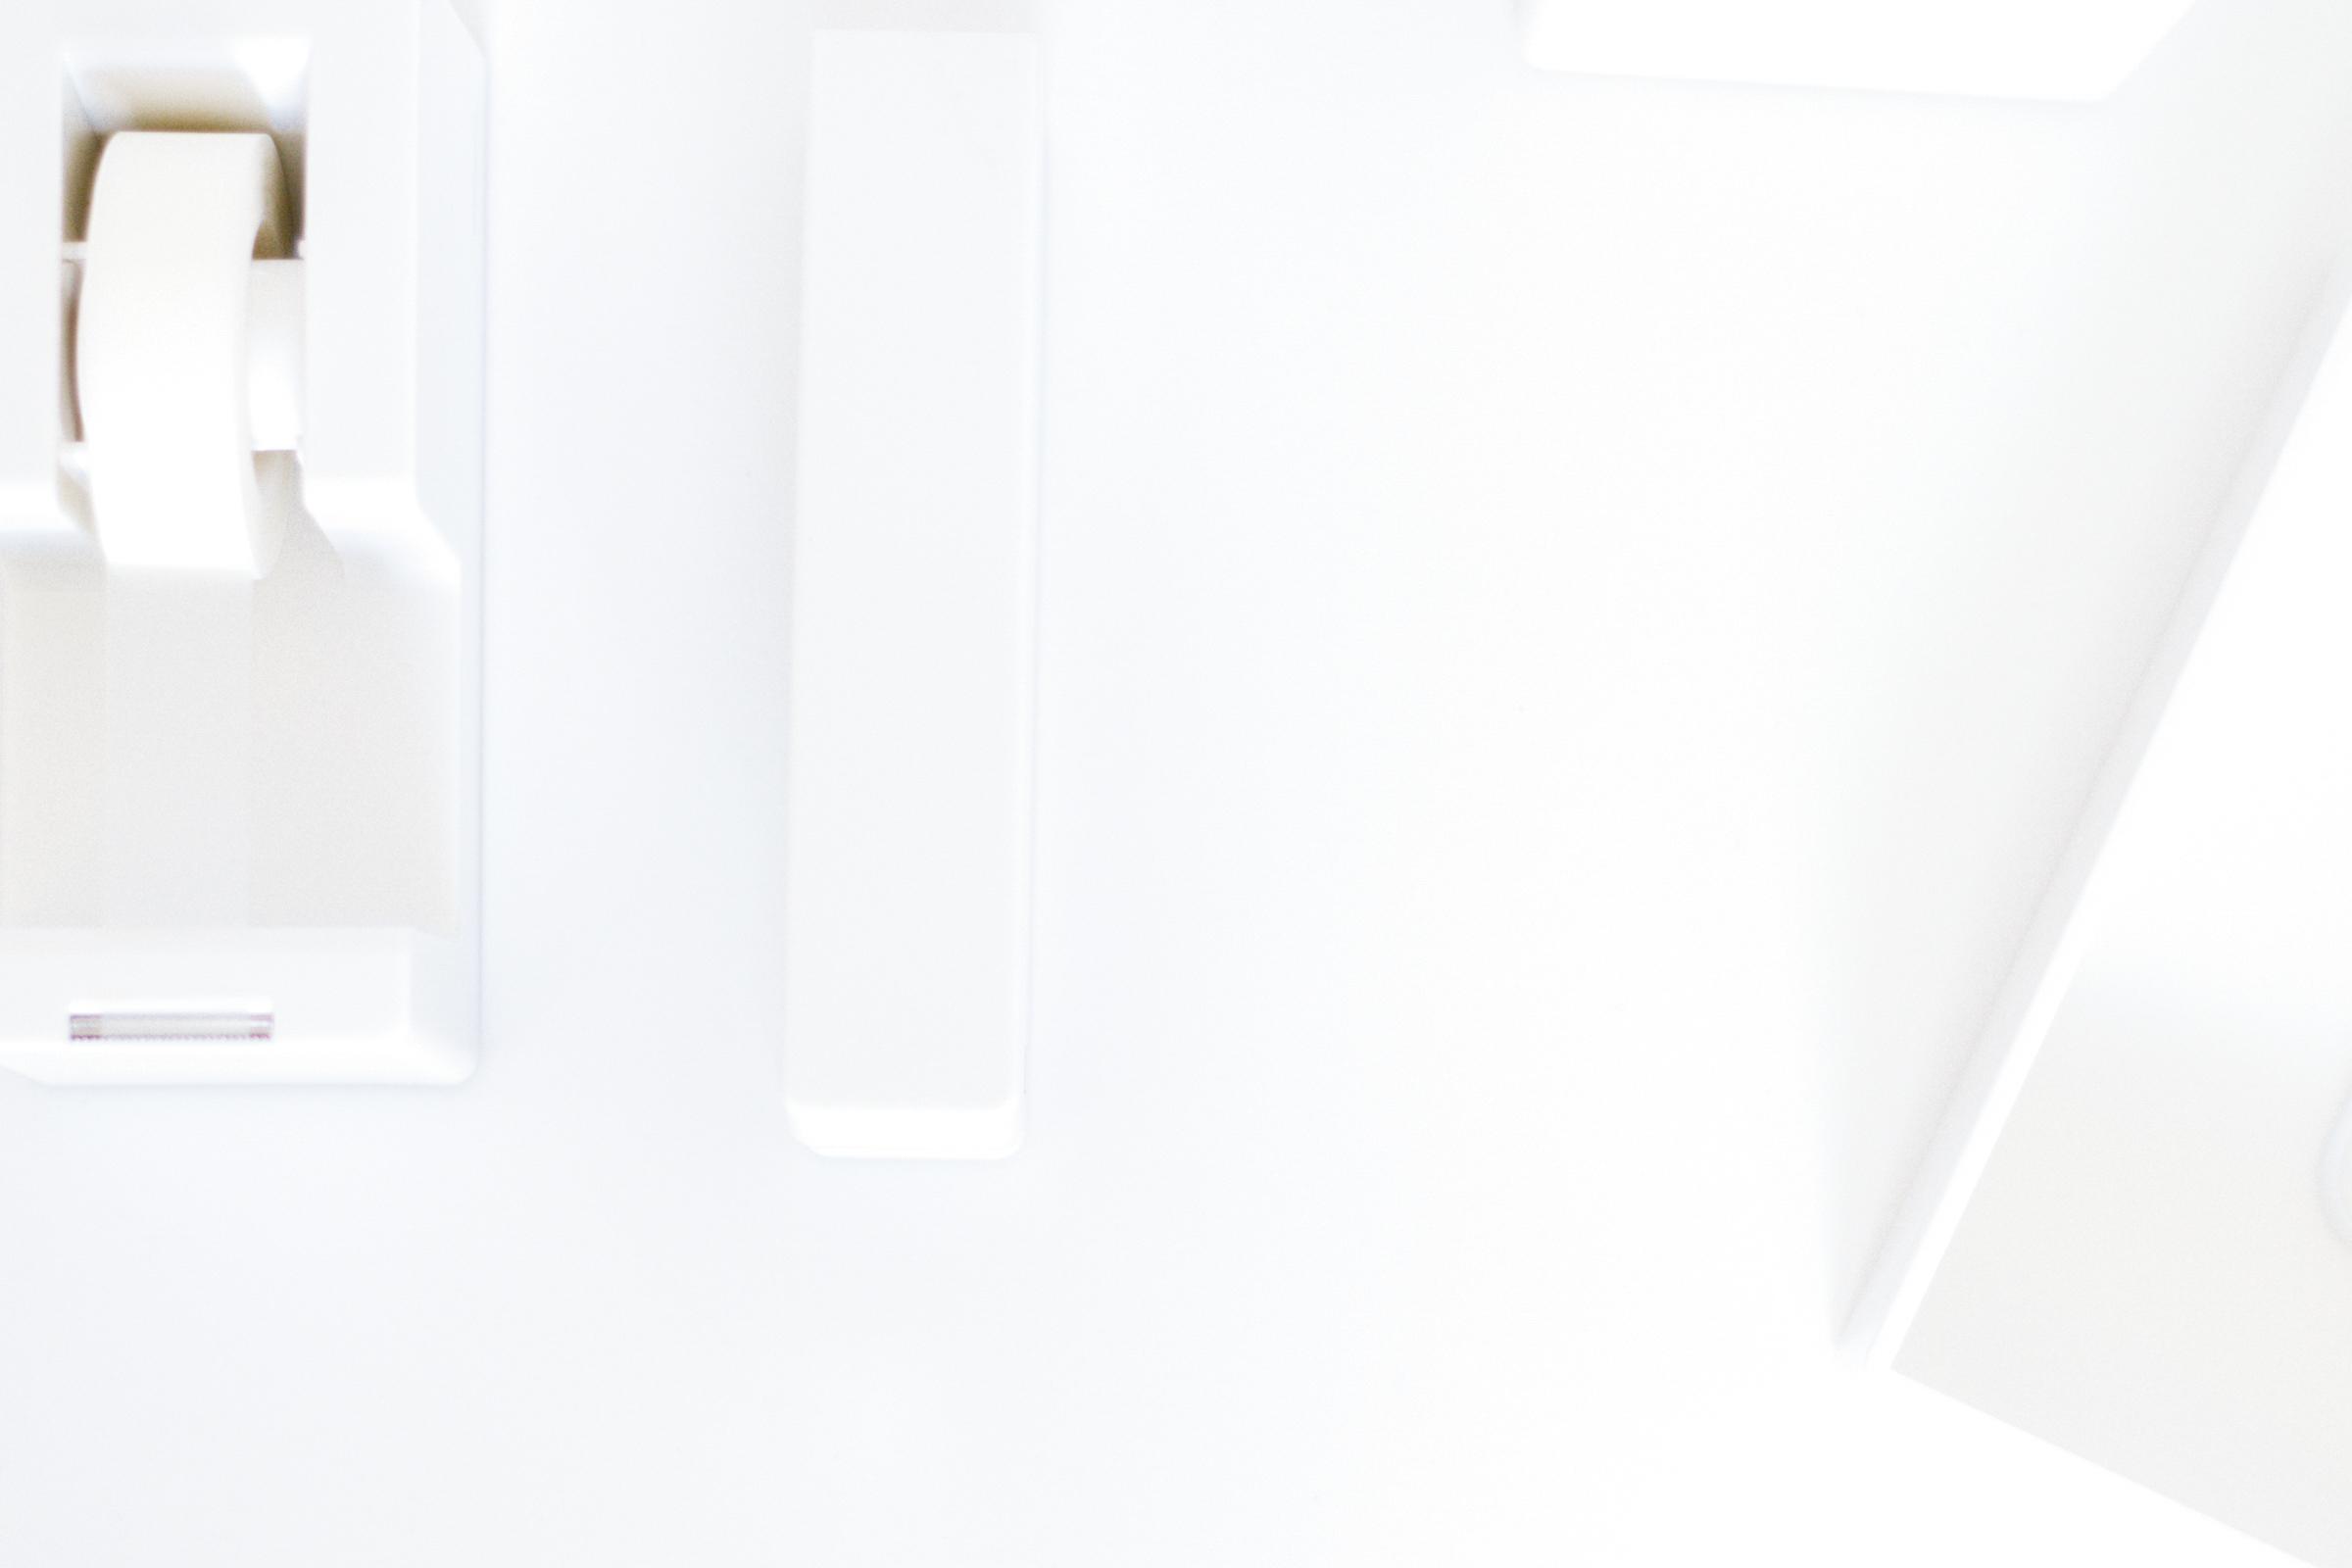 PBD-WhiteOut-Desktop-1.jpg